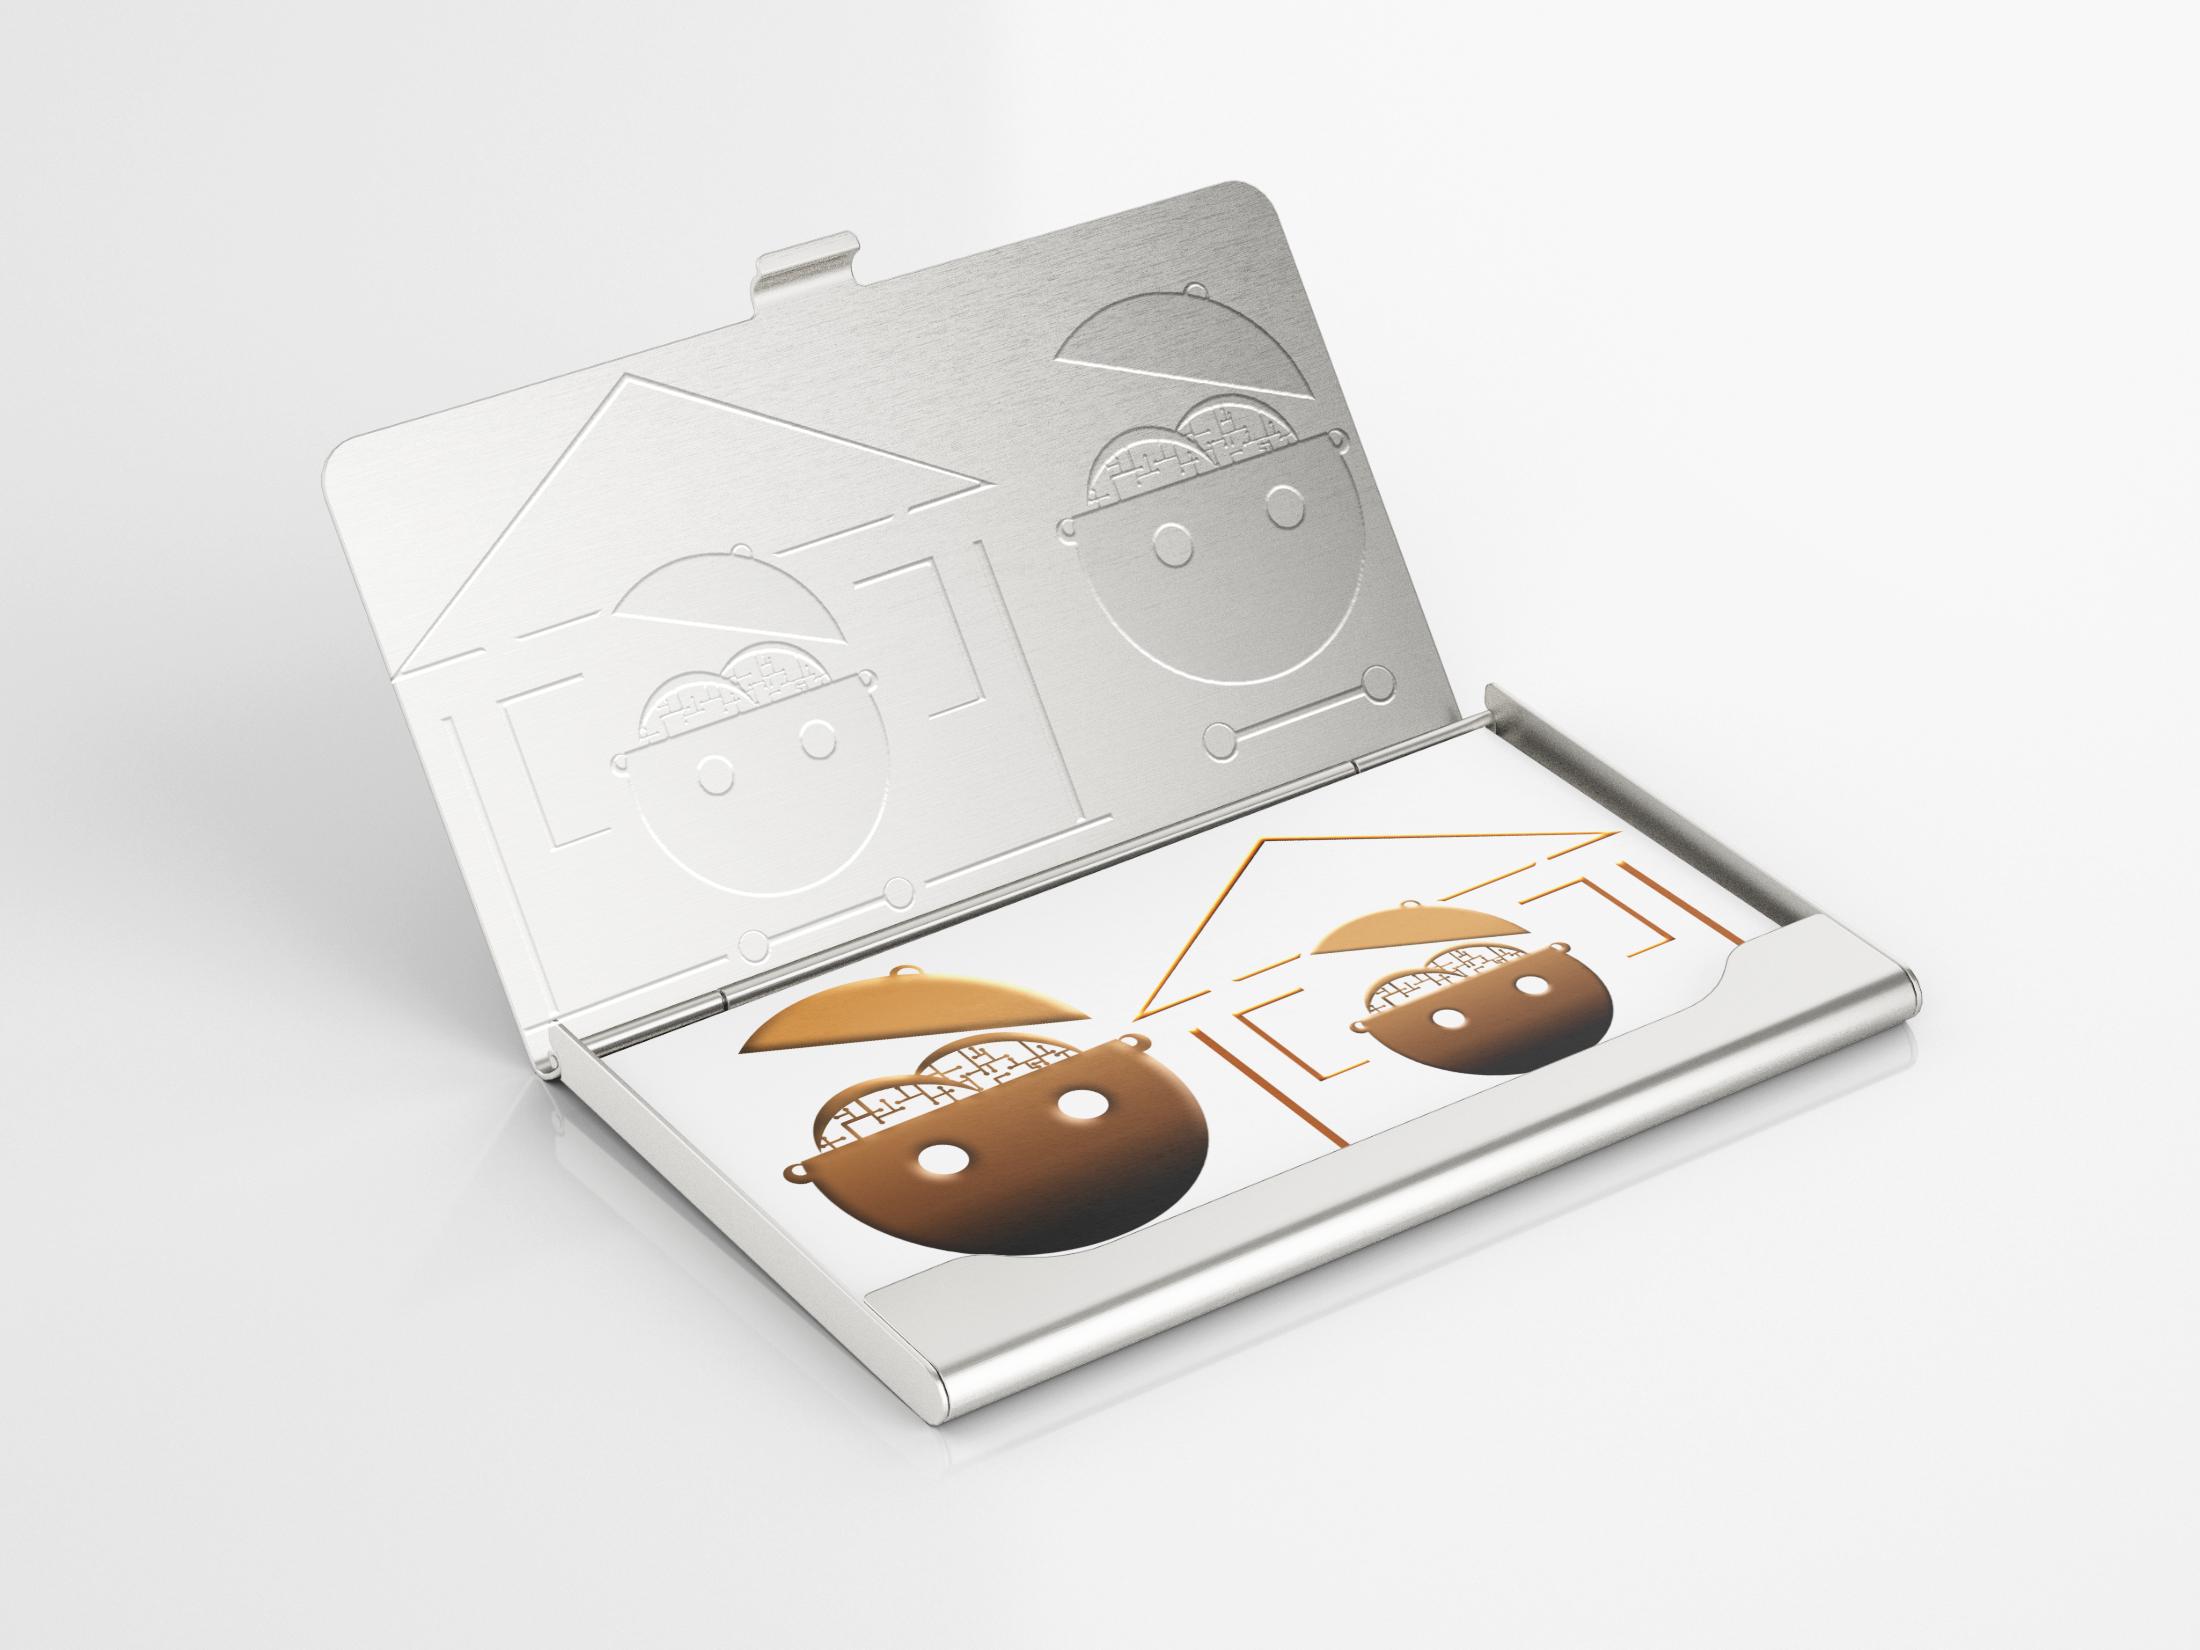 Разработать логотип и фавикон для IT- компании фото f_7885d542ab566dfe.jpg